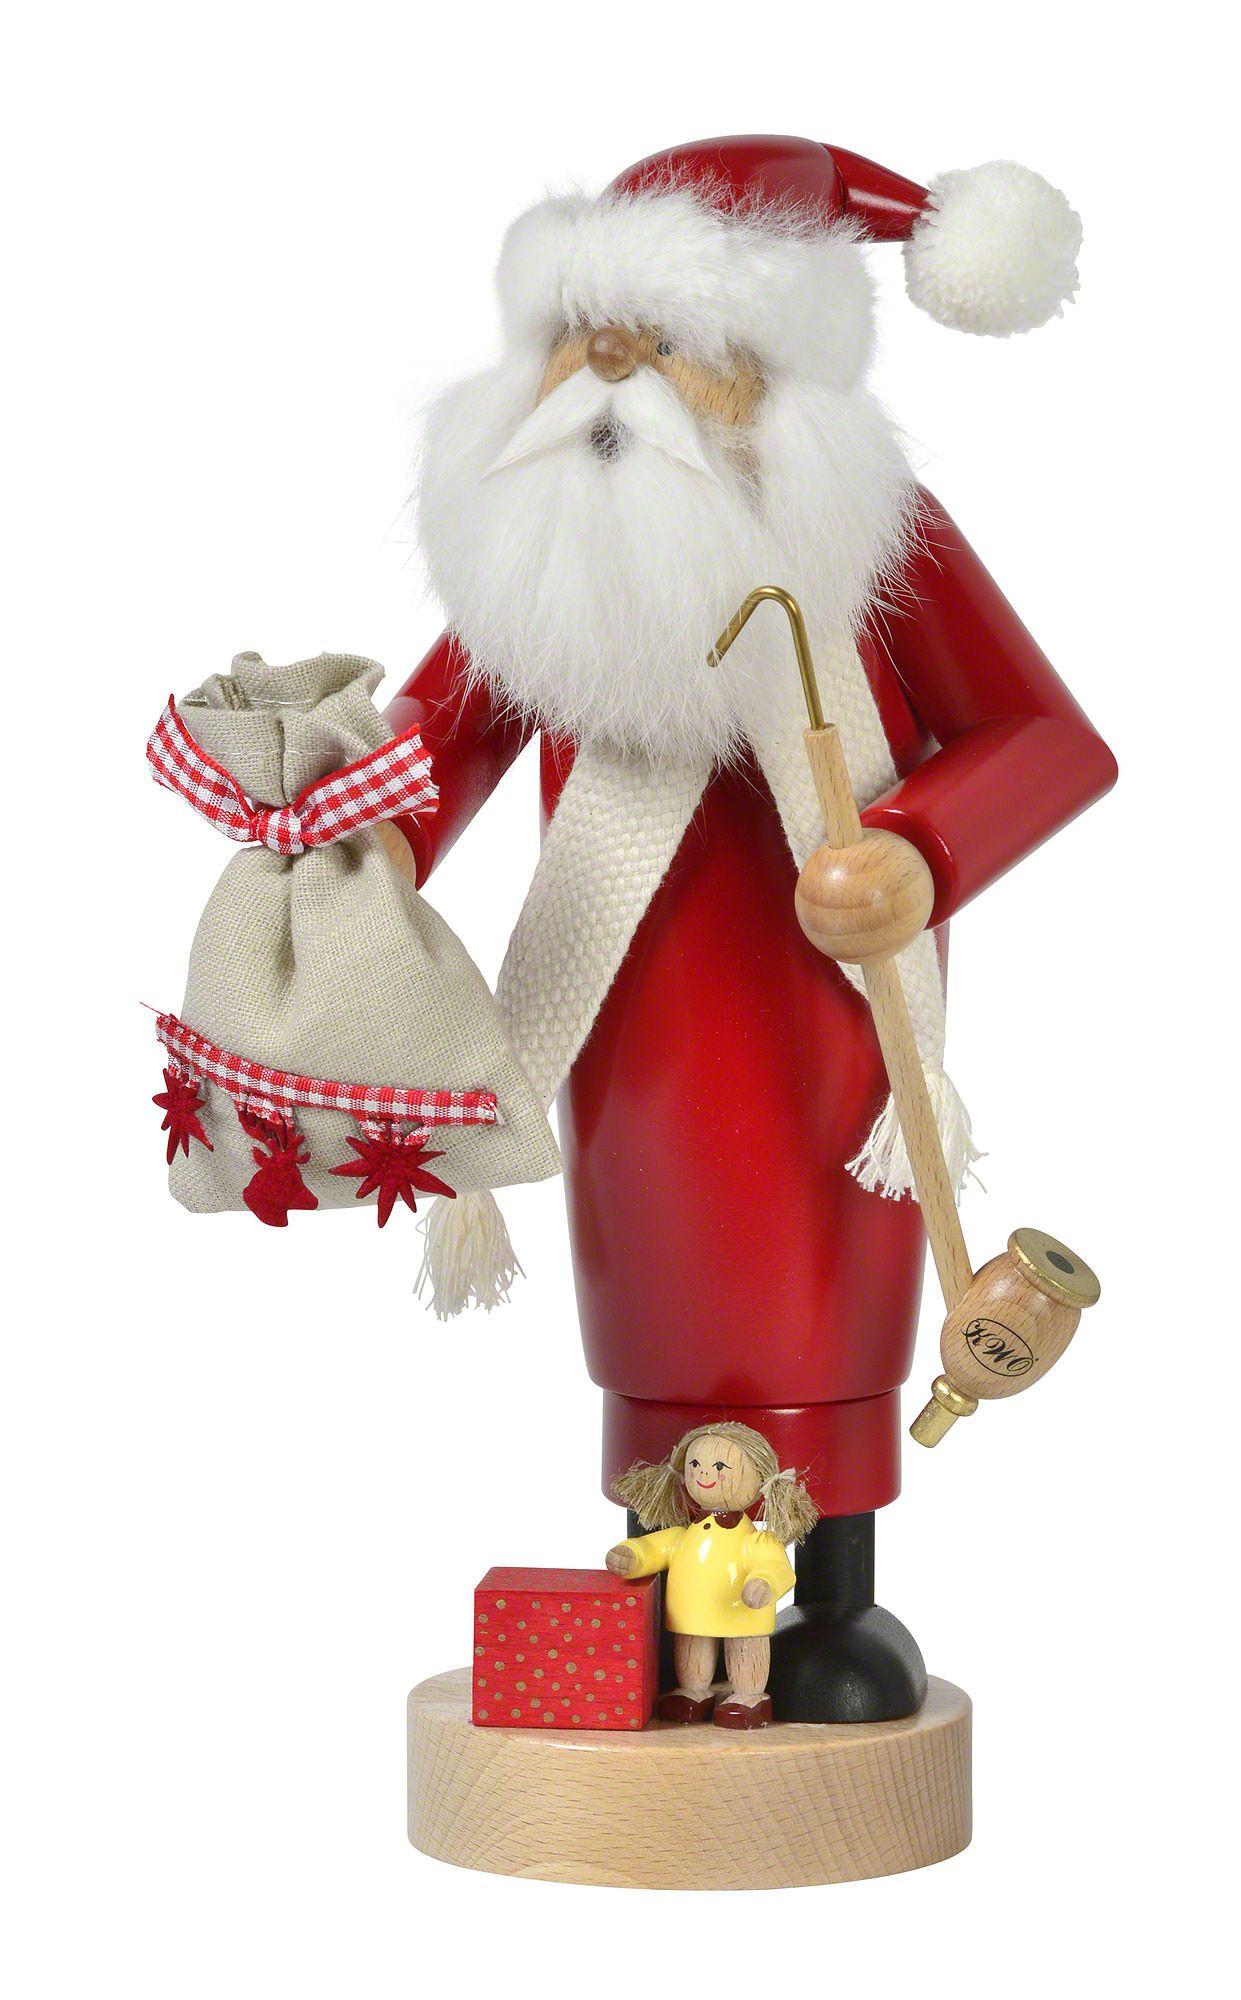 Smoker Santa with Doll 25 cm / 10 inch German smoker